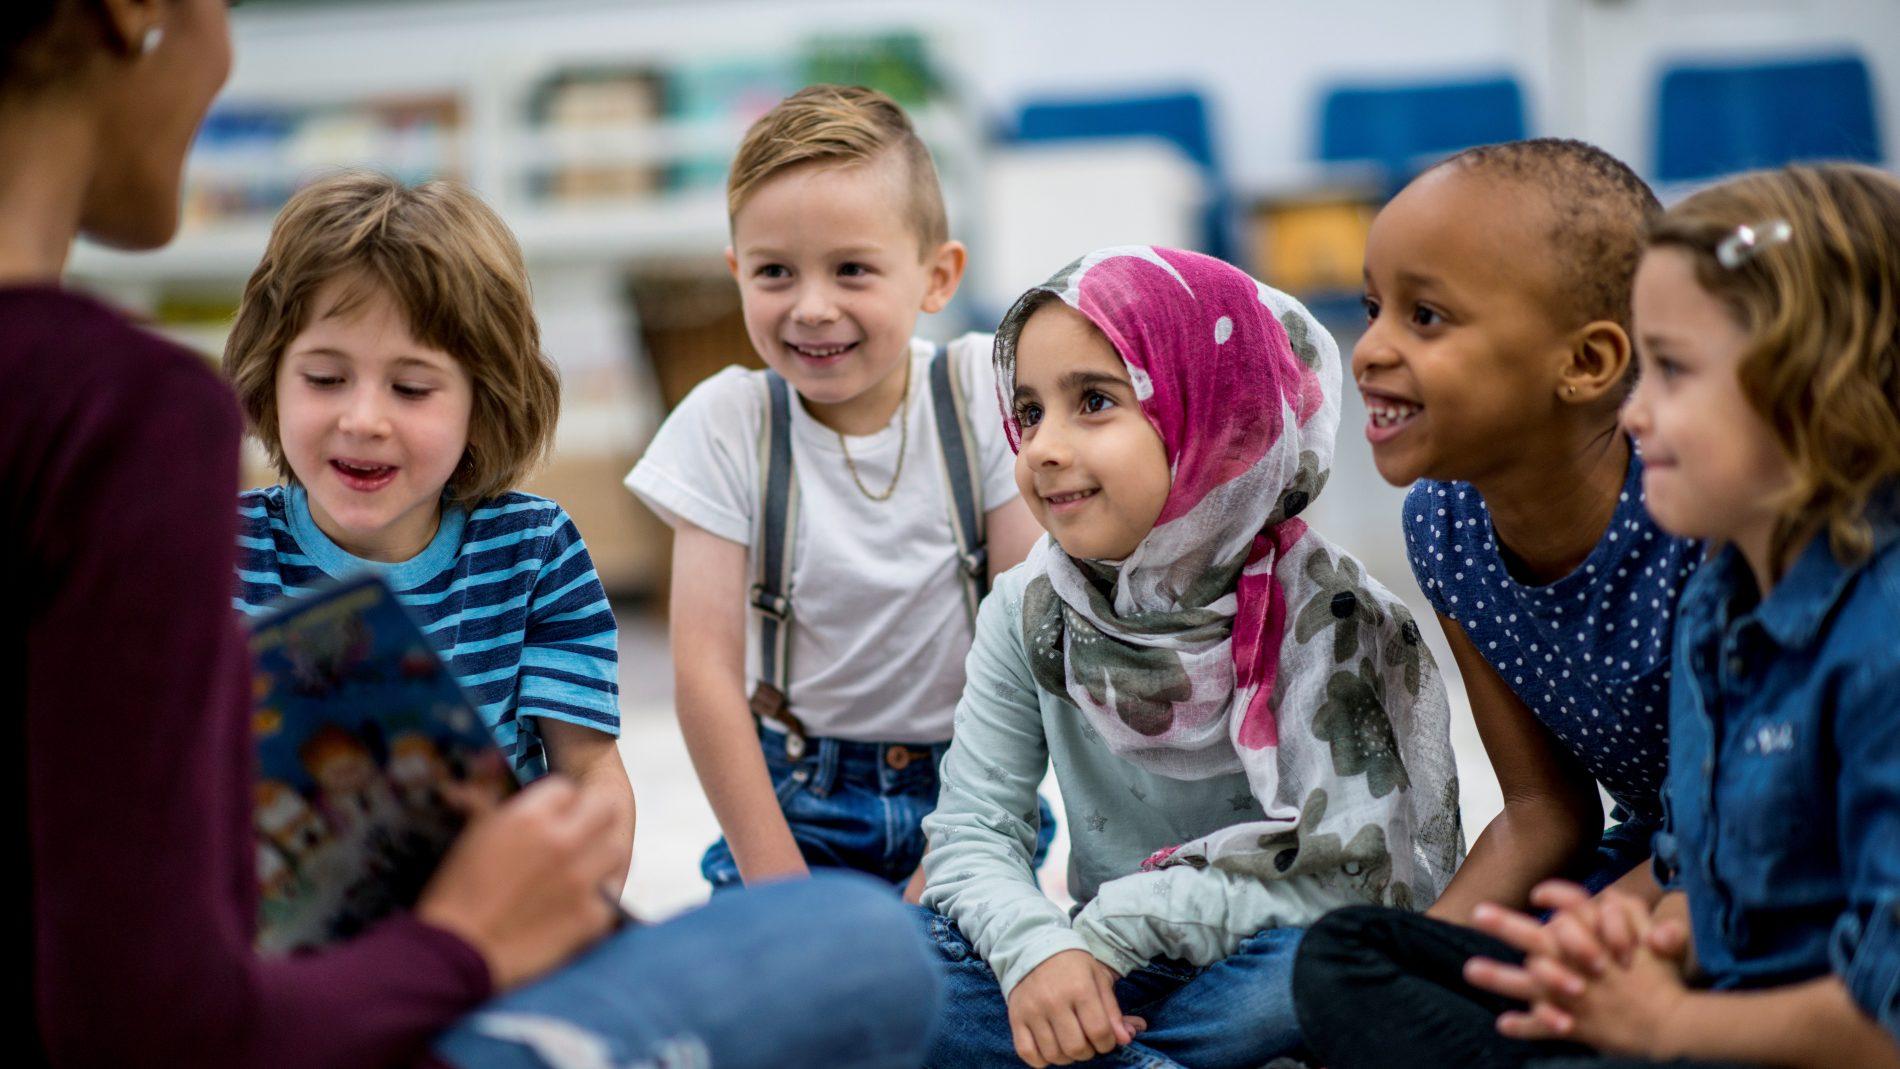 Smiling children listening to story